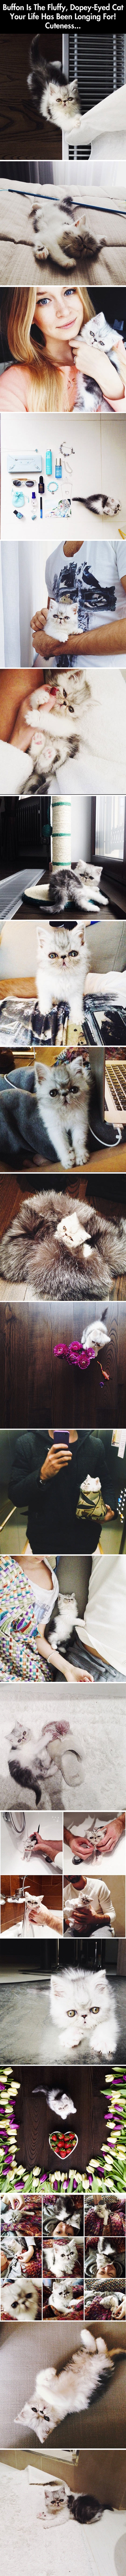 funny-Buffon-fluffy-cute-kitten